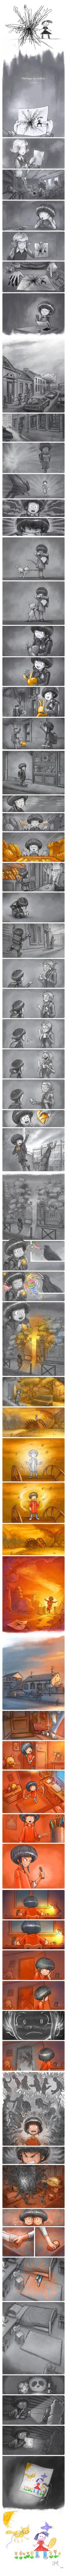 Such a wonderful story...